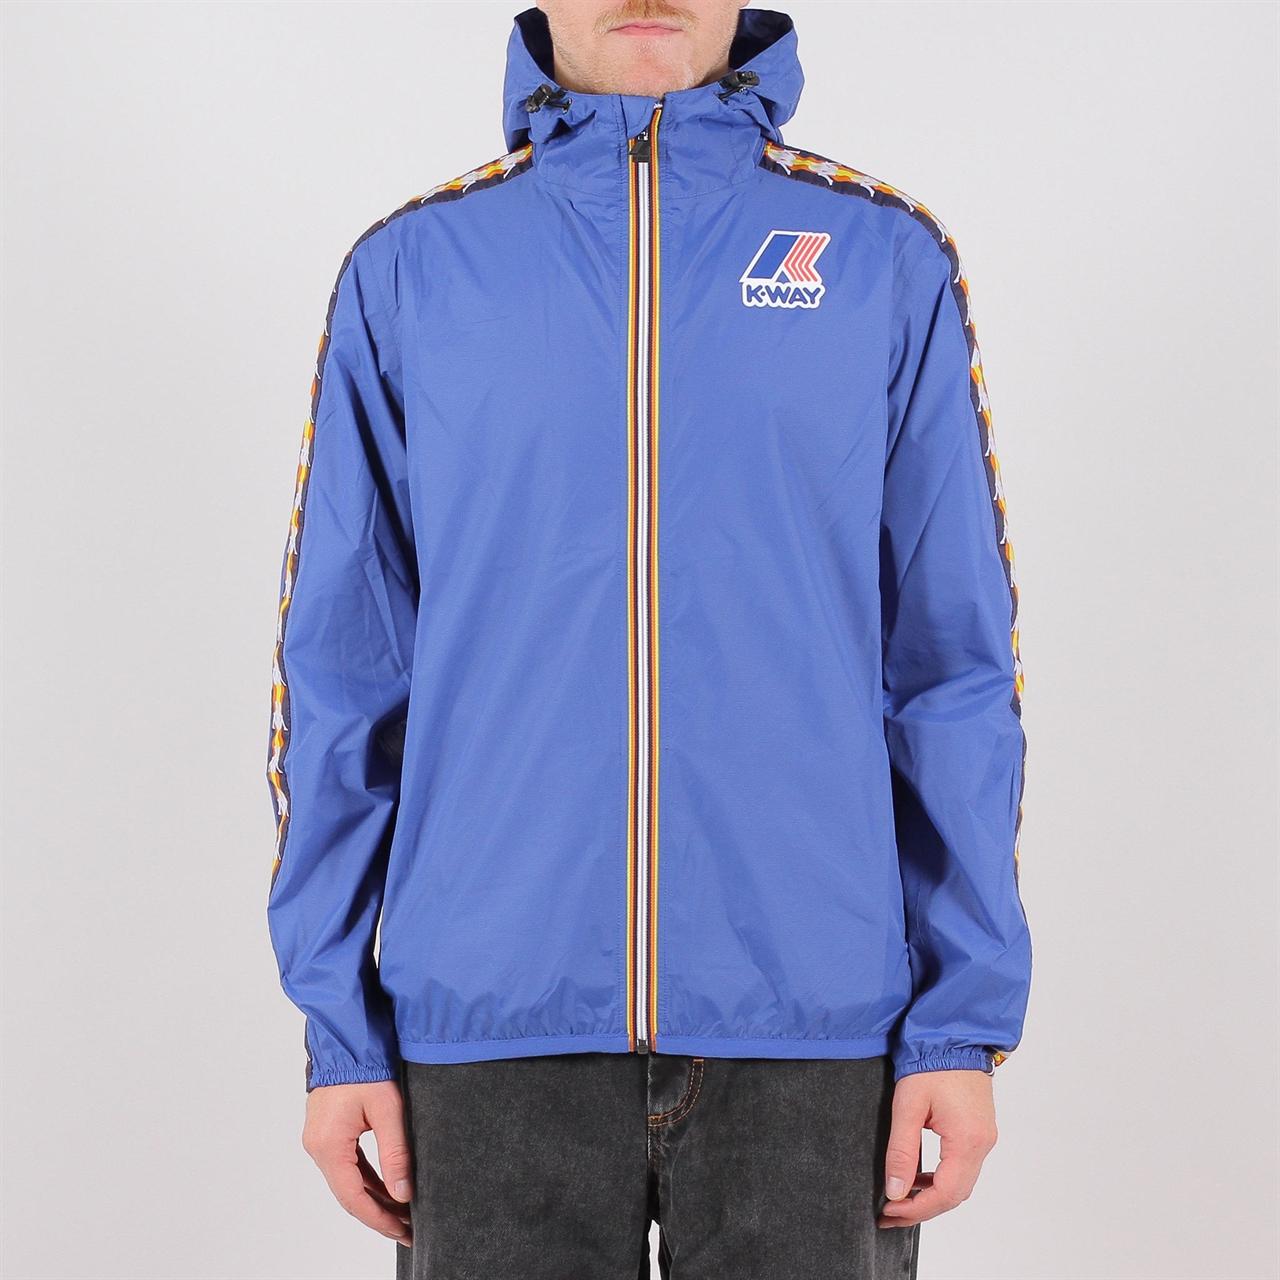 0f6fc5c308 Shelta - K-Way x Kappa Claude Banda Jacket Blue (K009D90-618)